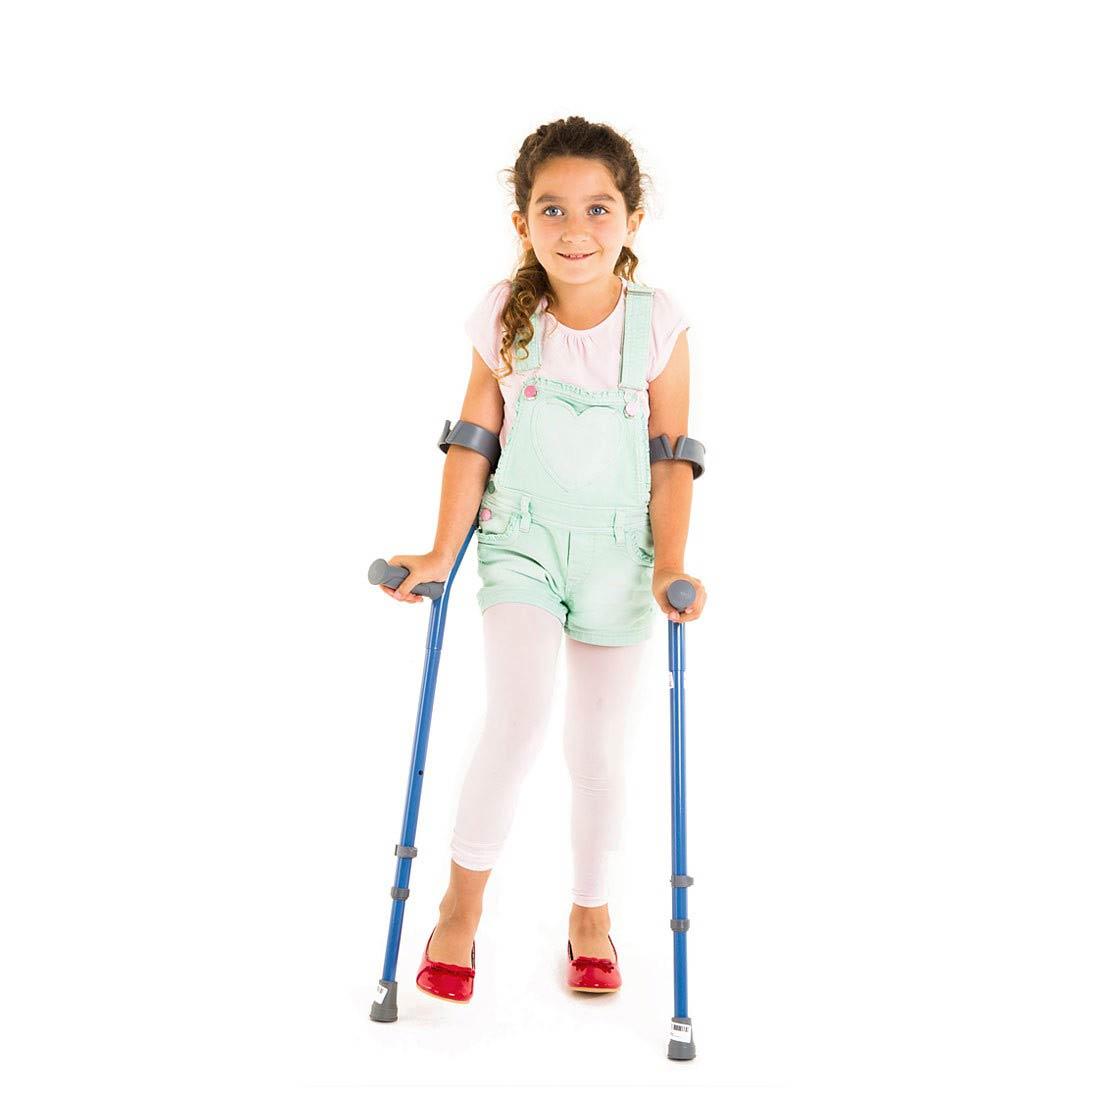 Walk Easy Youth Forearm Height Adjustable Crutches - Walk Easy